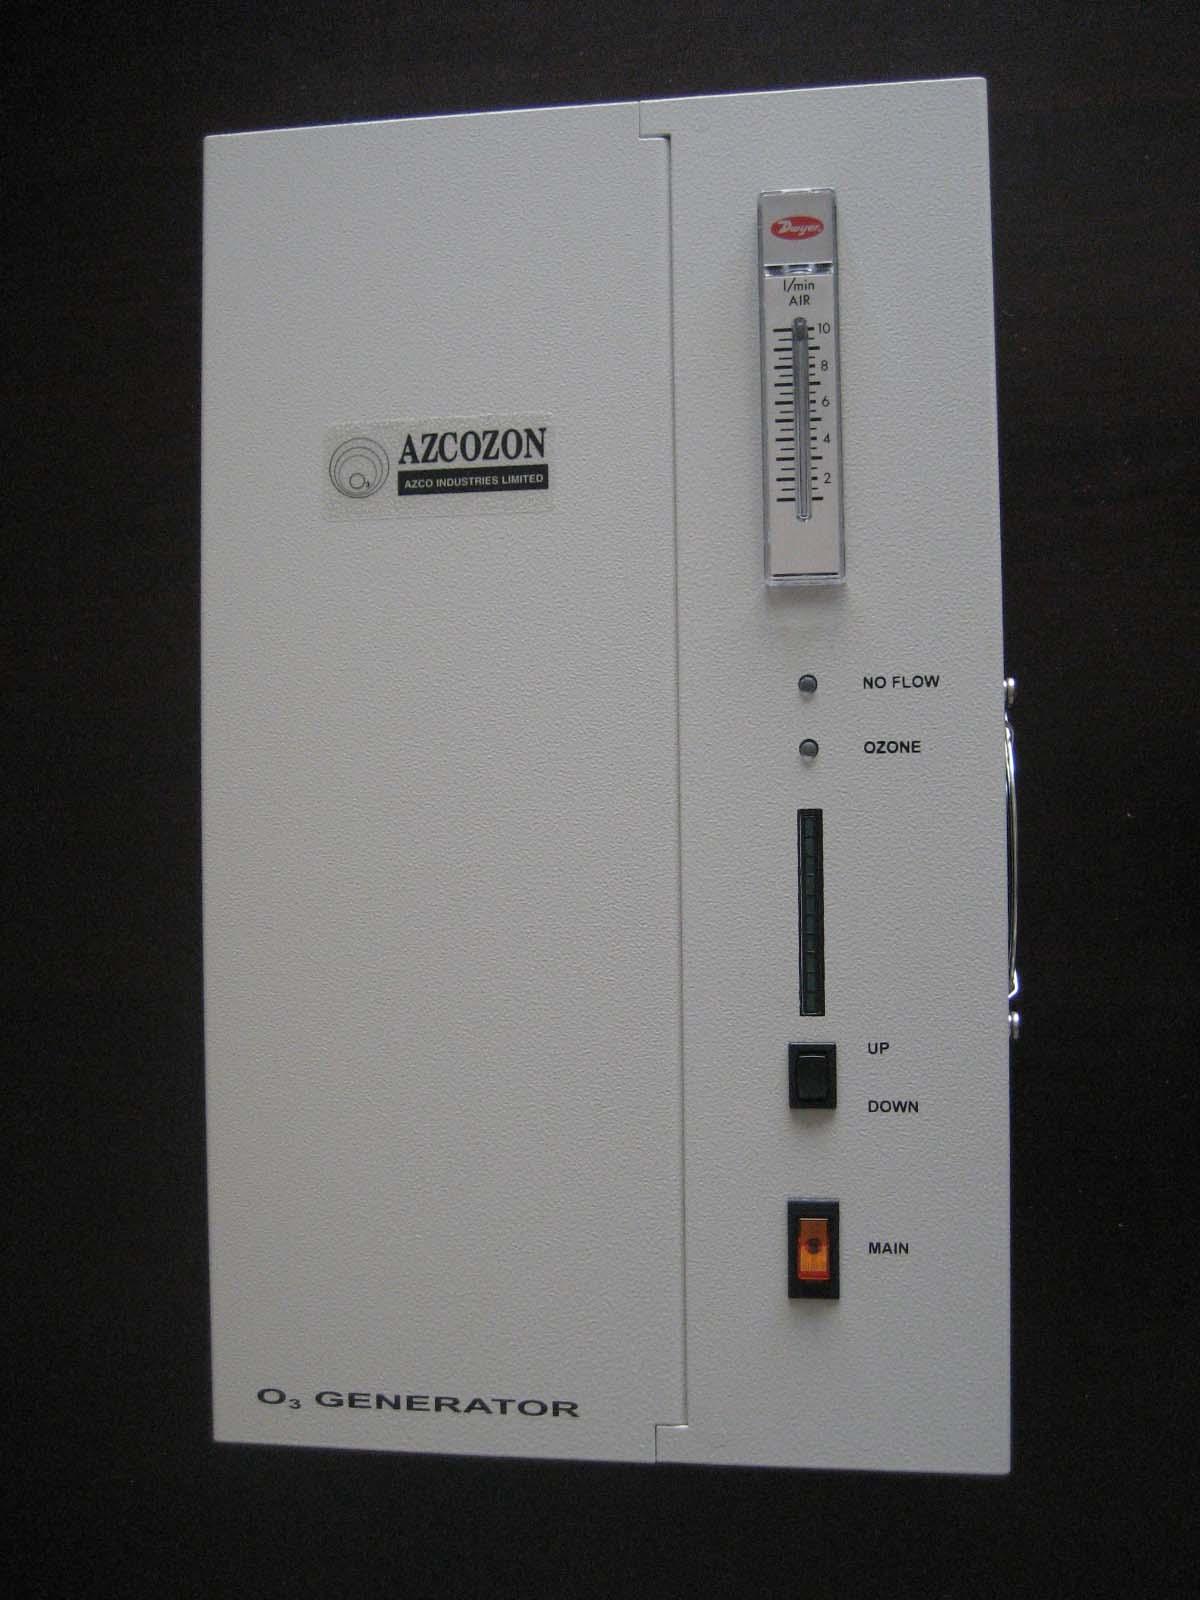 加拿大AZCO爱克VMUS-4型13g/h进口臭氧发生器